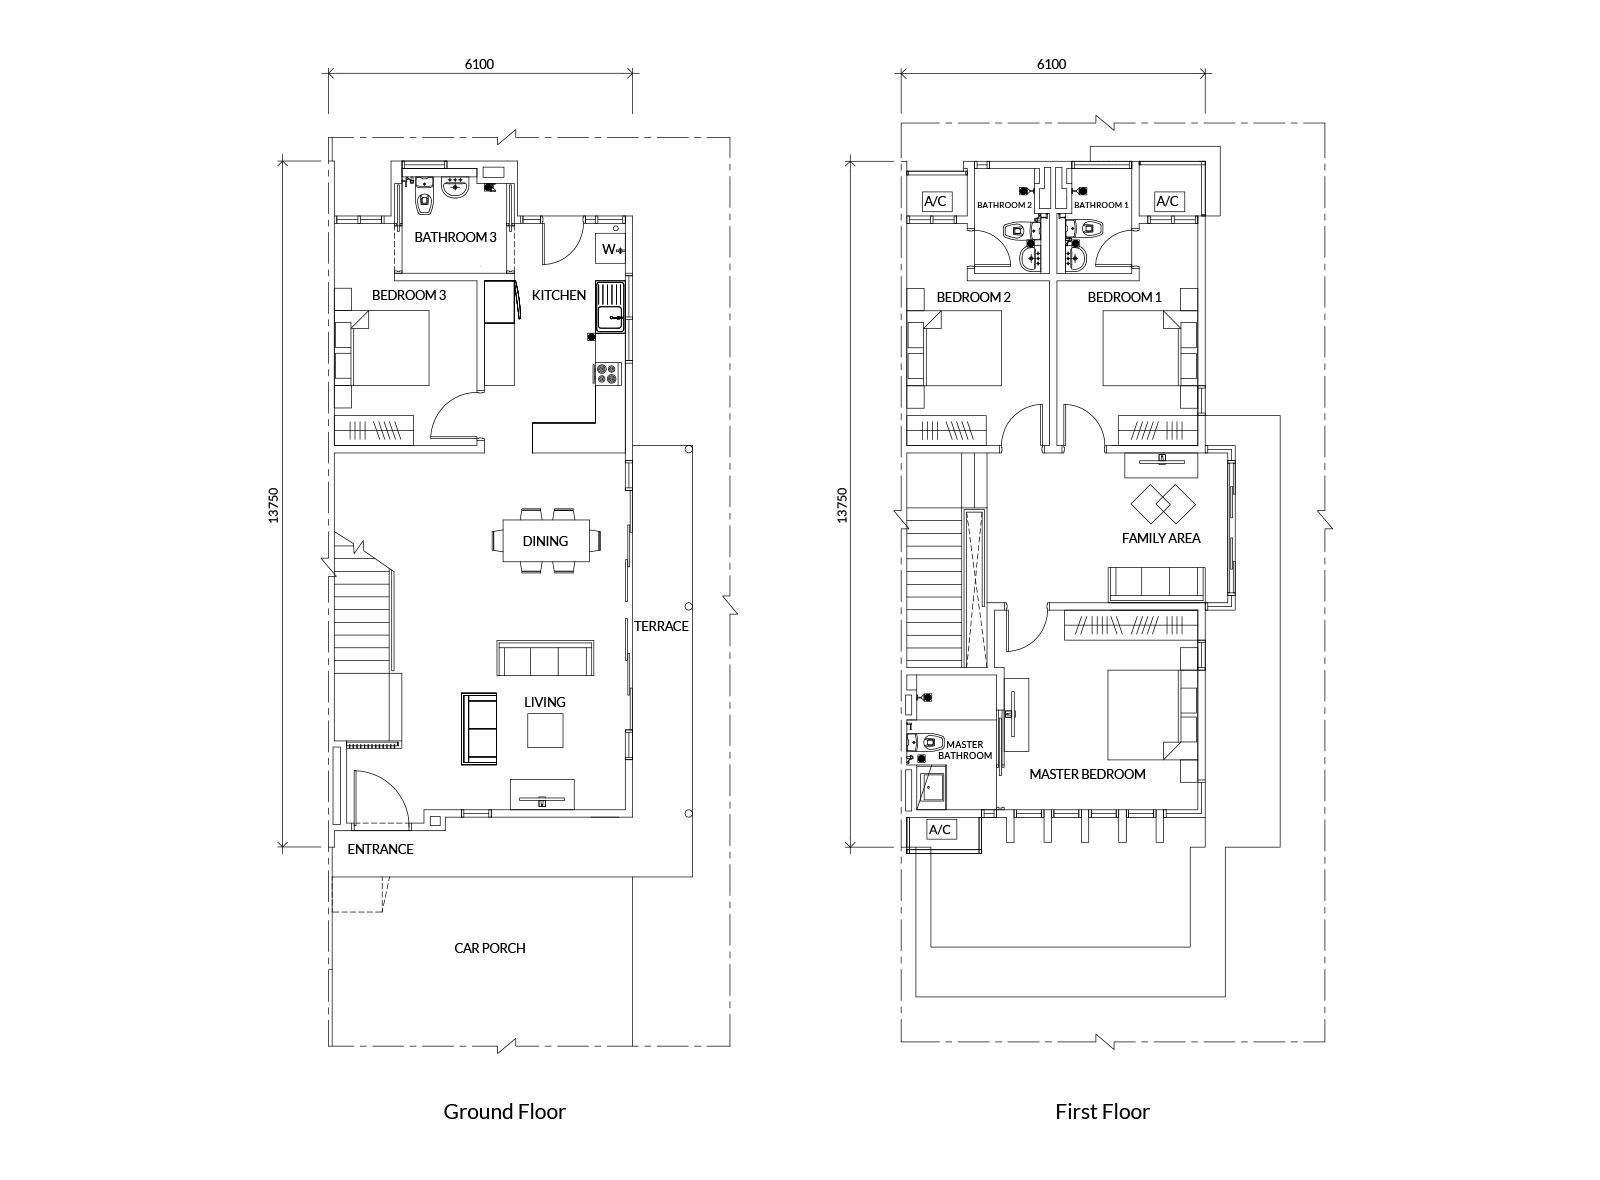 100 types staircase names floor plan free floor for Meuble belot soignies